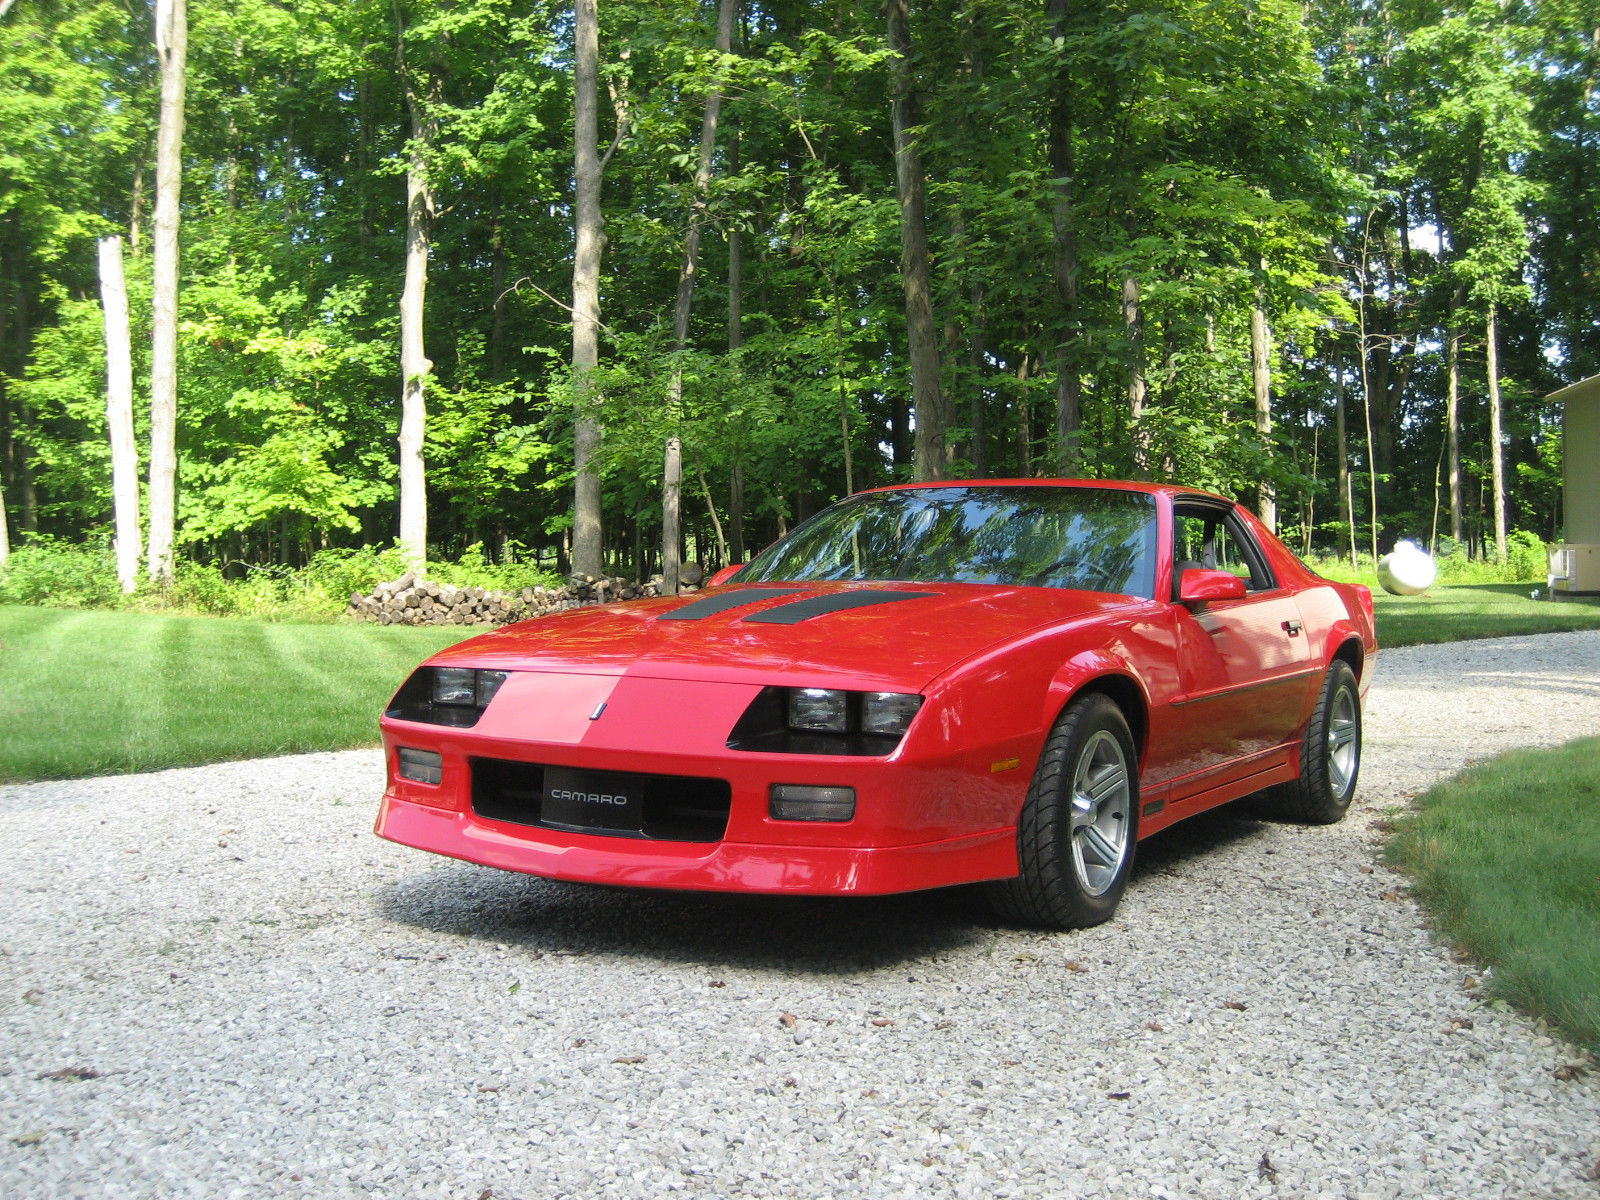 1990 Chevrolet Camaro IROC Z 1LE Classic Chevrolet